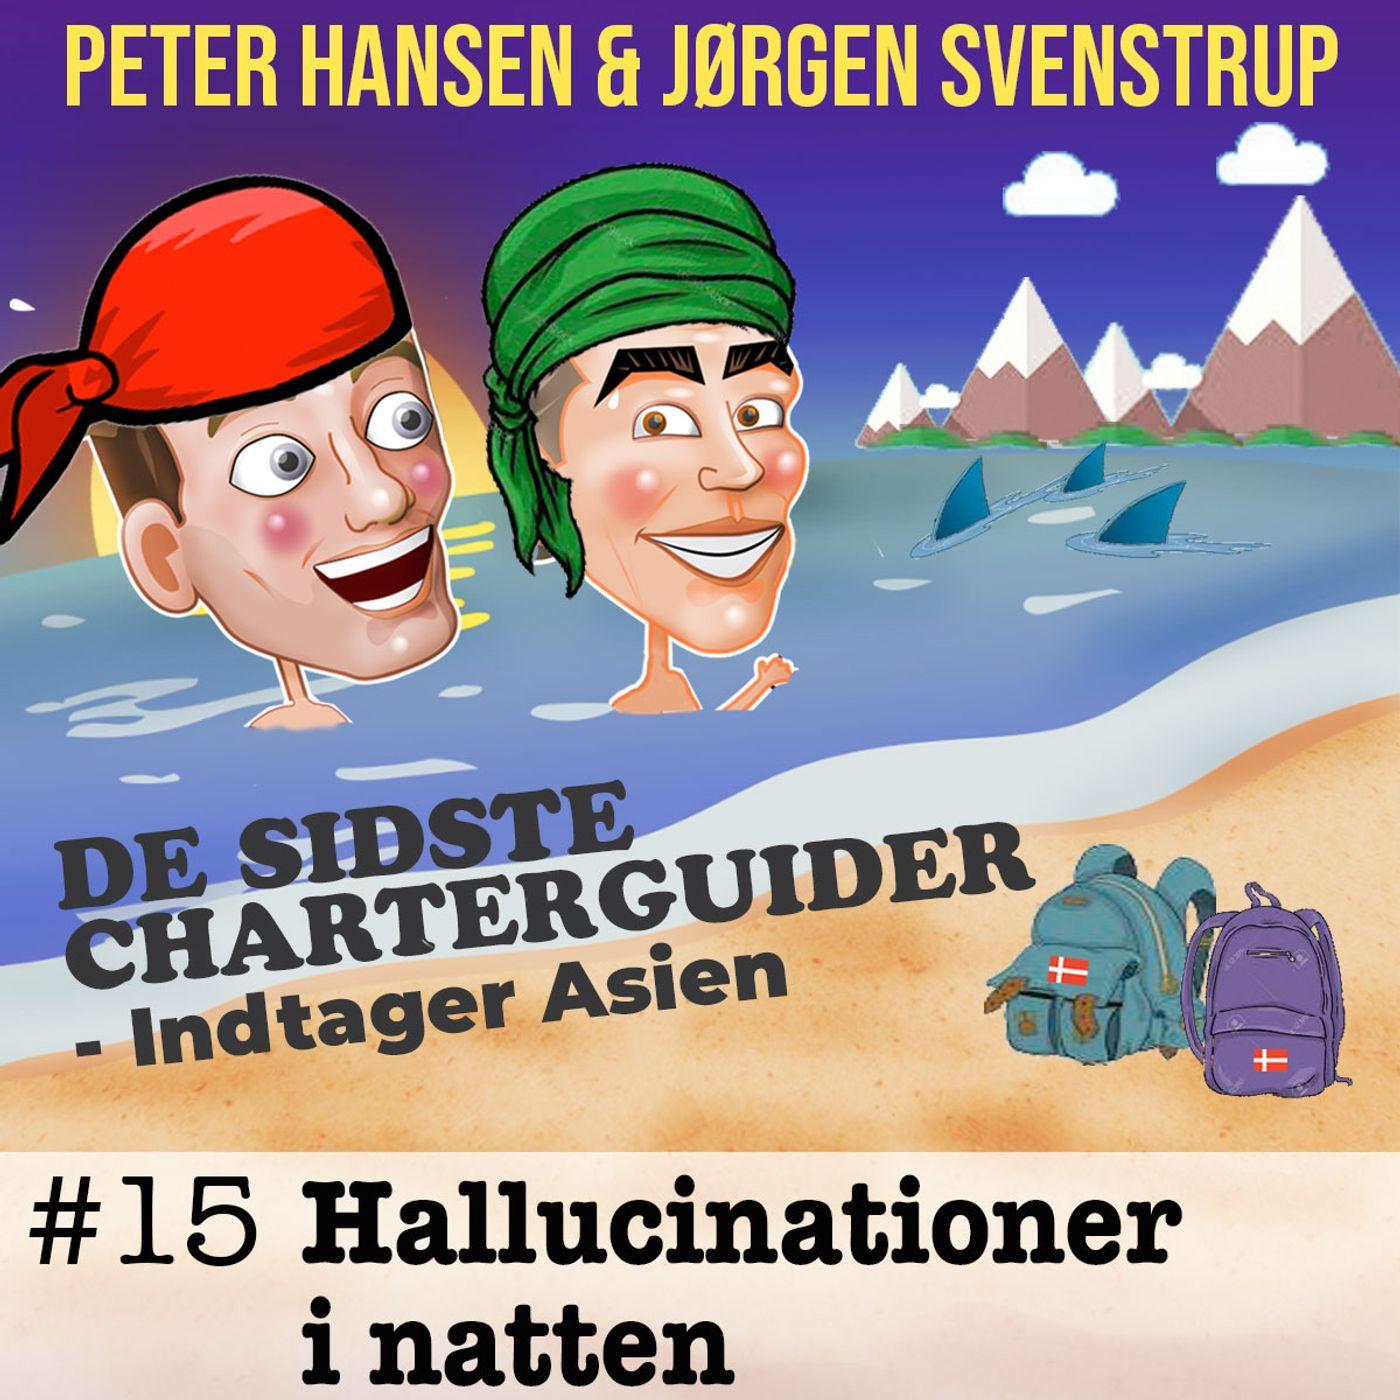 #15 - Hallucinationer i natten